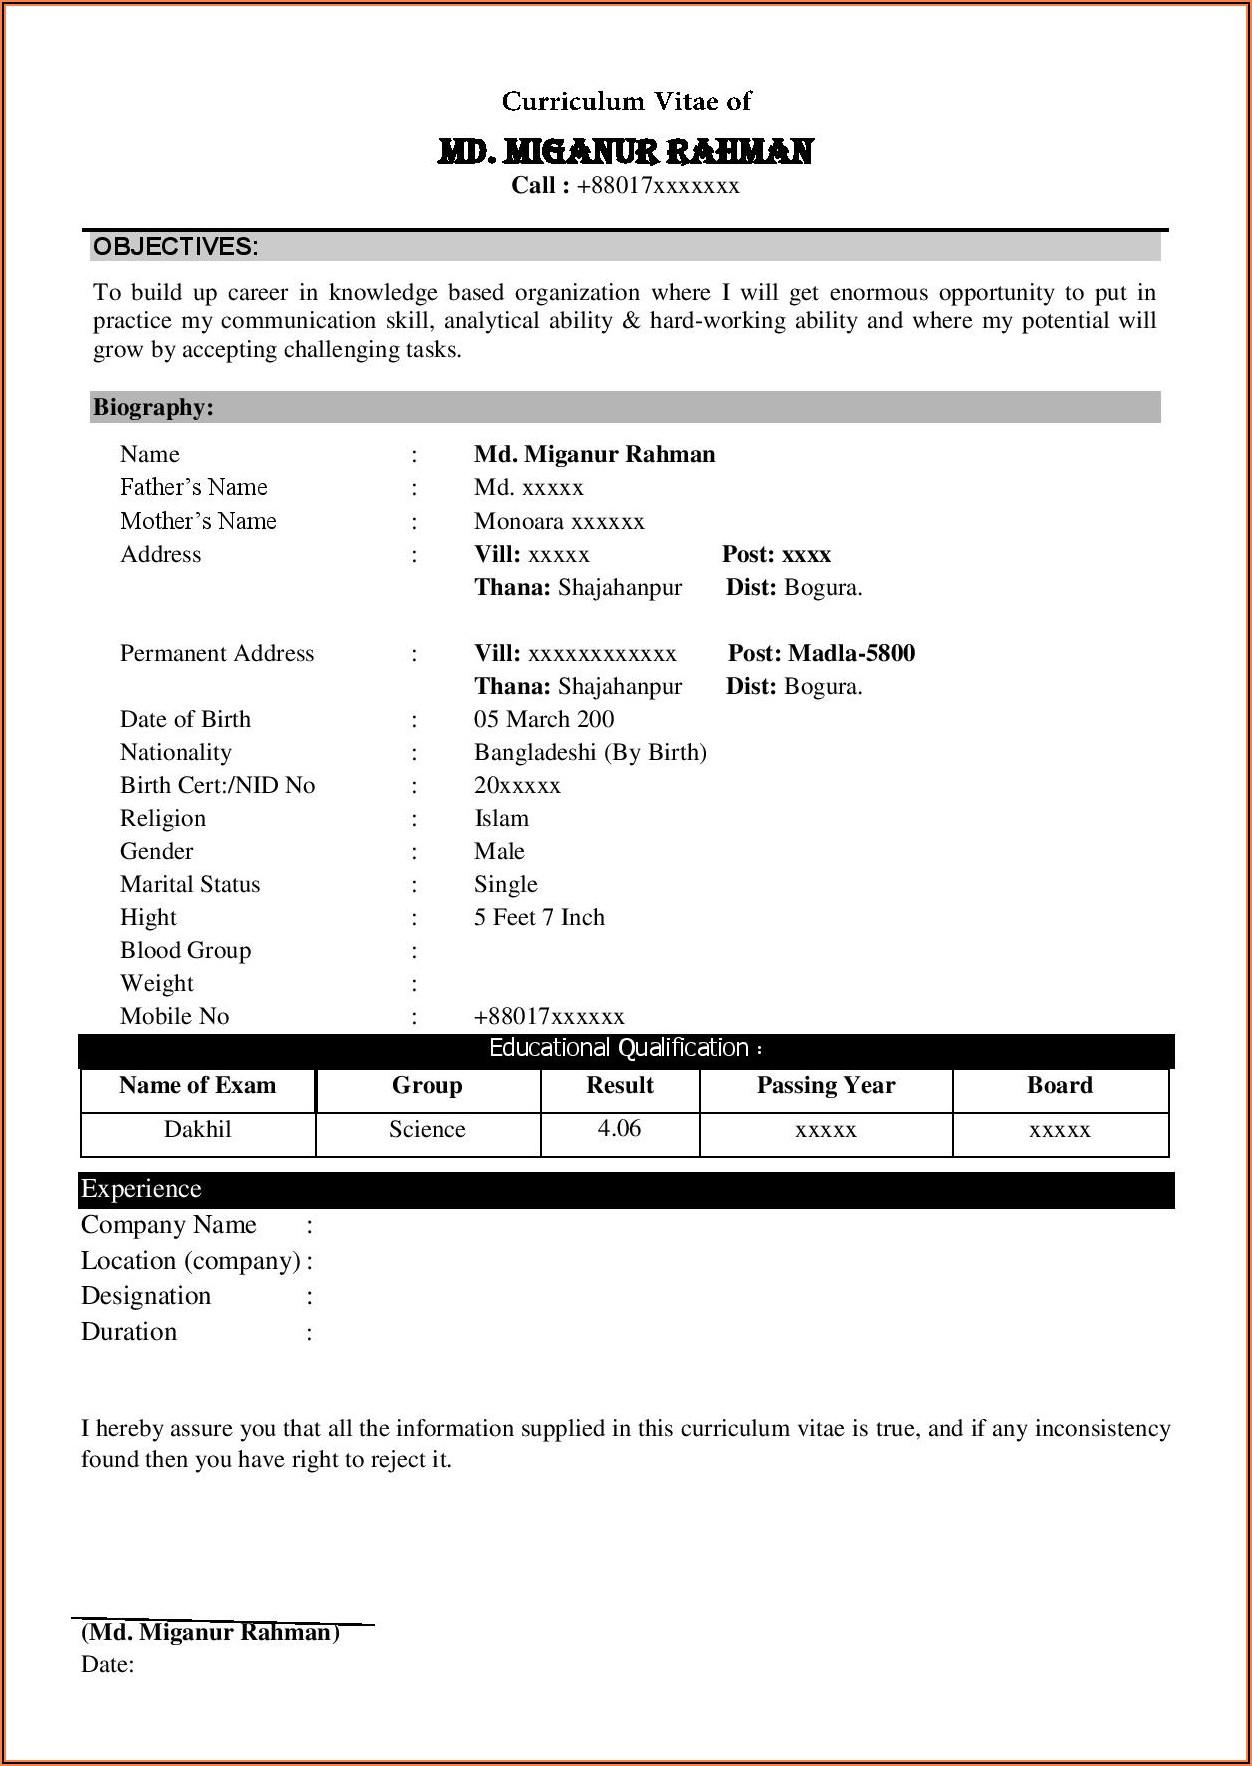 Curriculum Vitae Format Word File Free Download